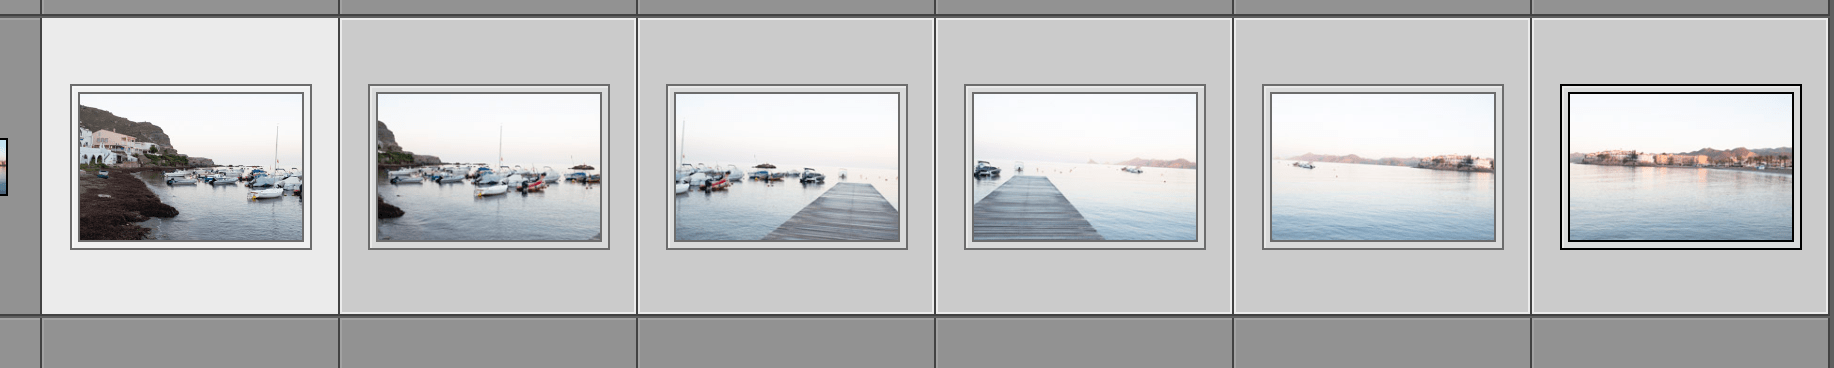 Serie de capturas con encuadre horizontal para montar la panorámica